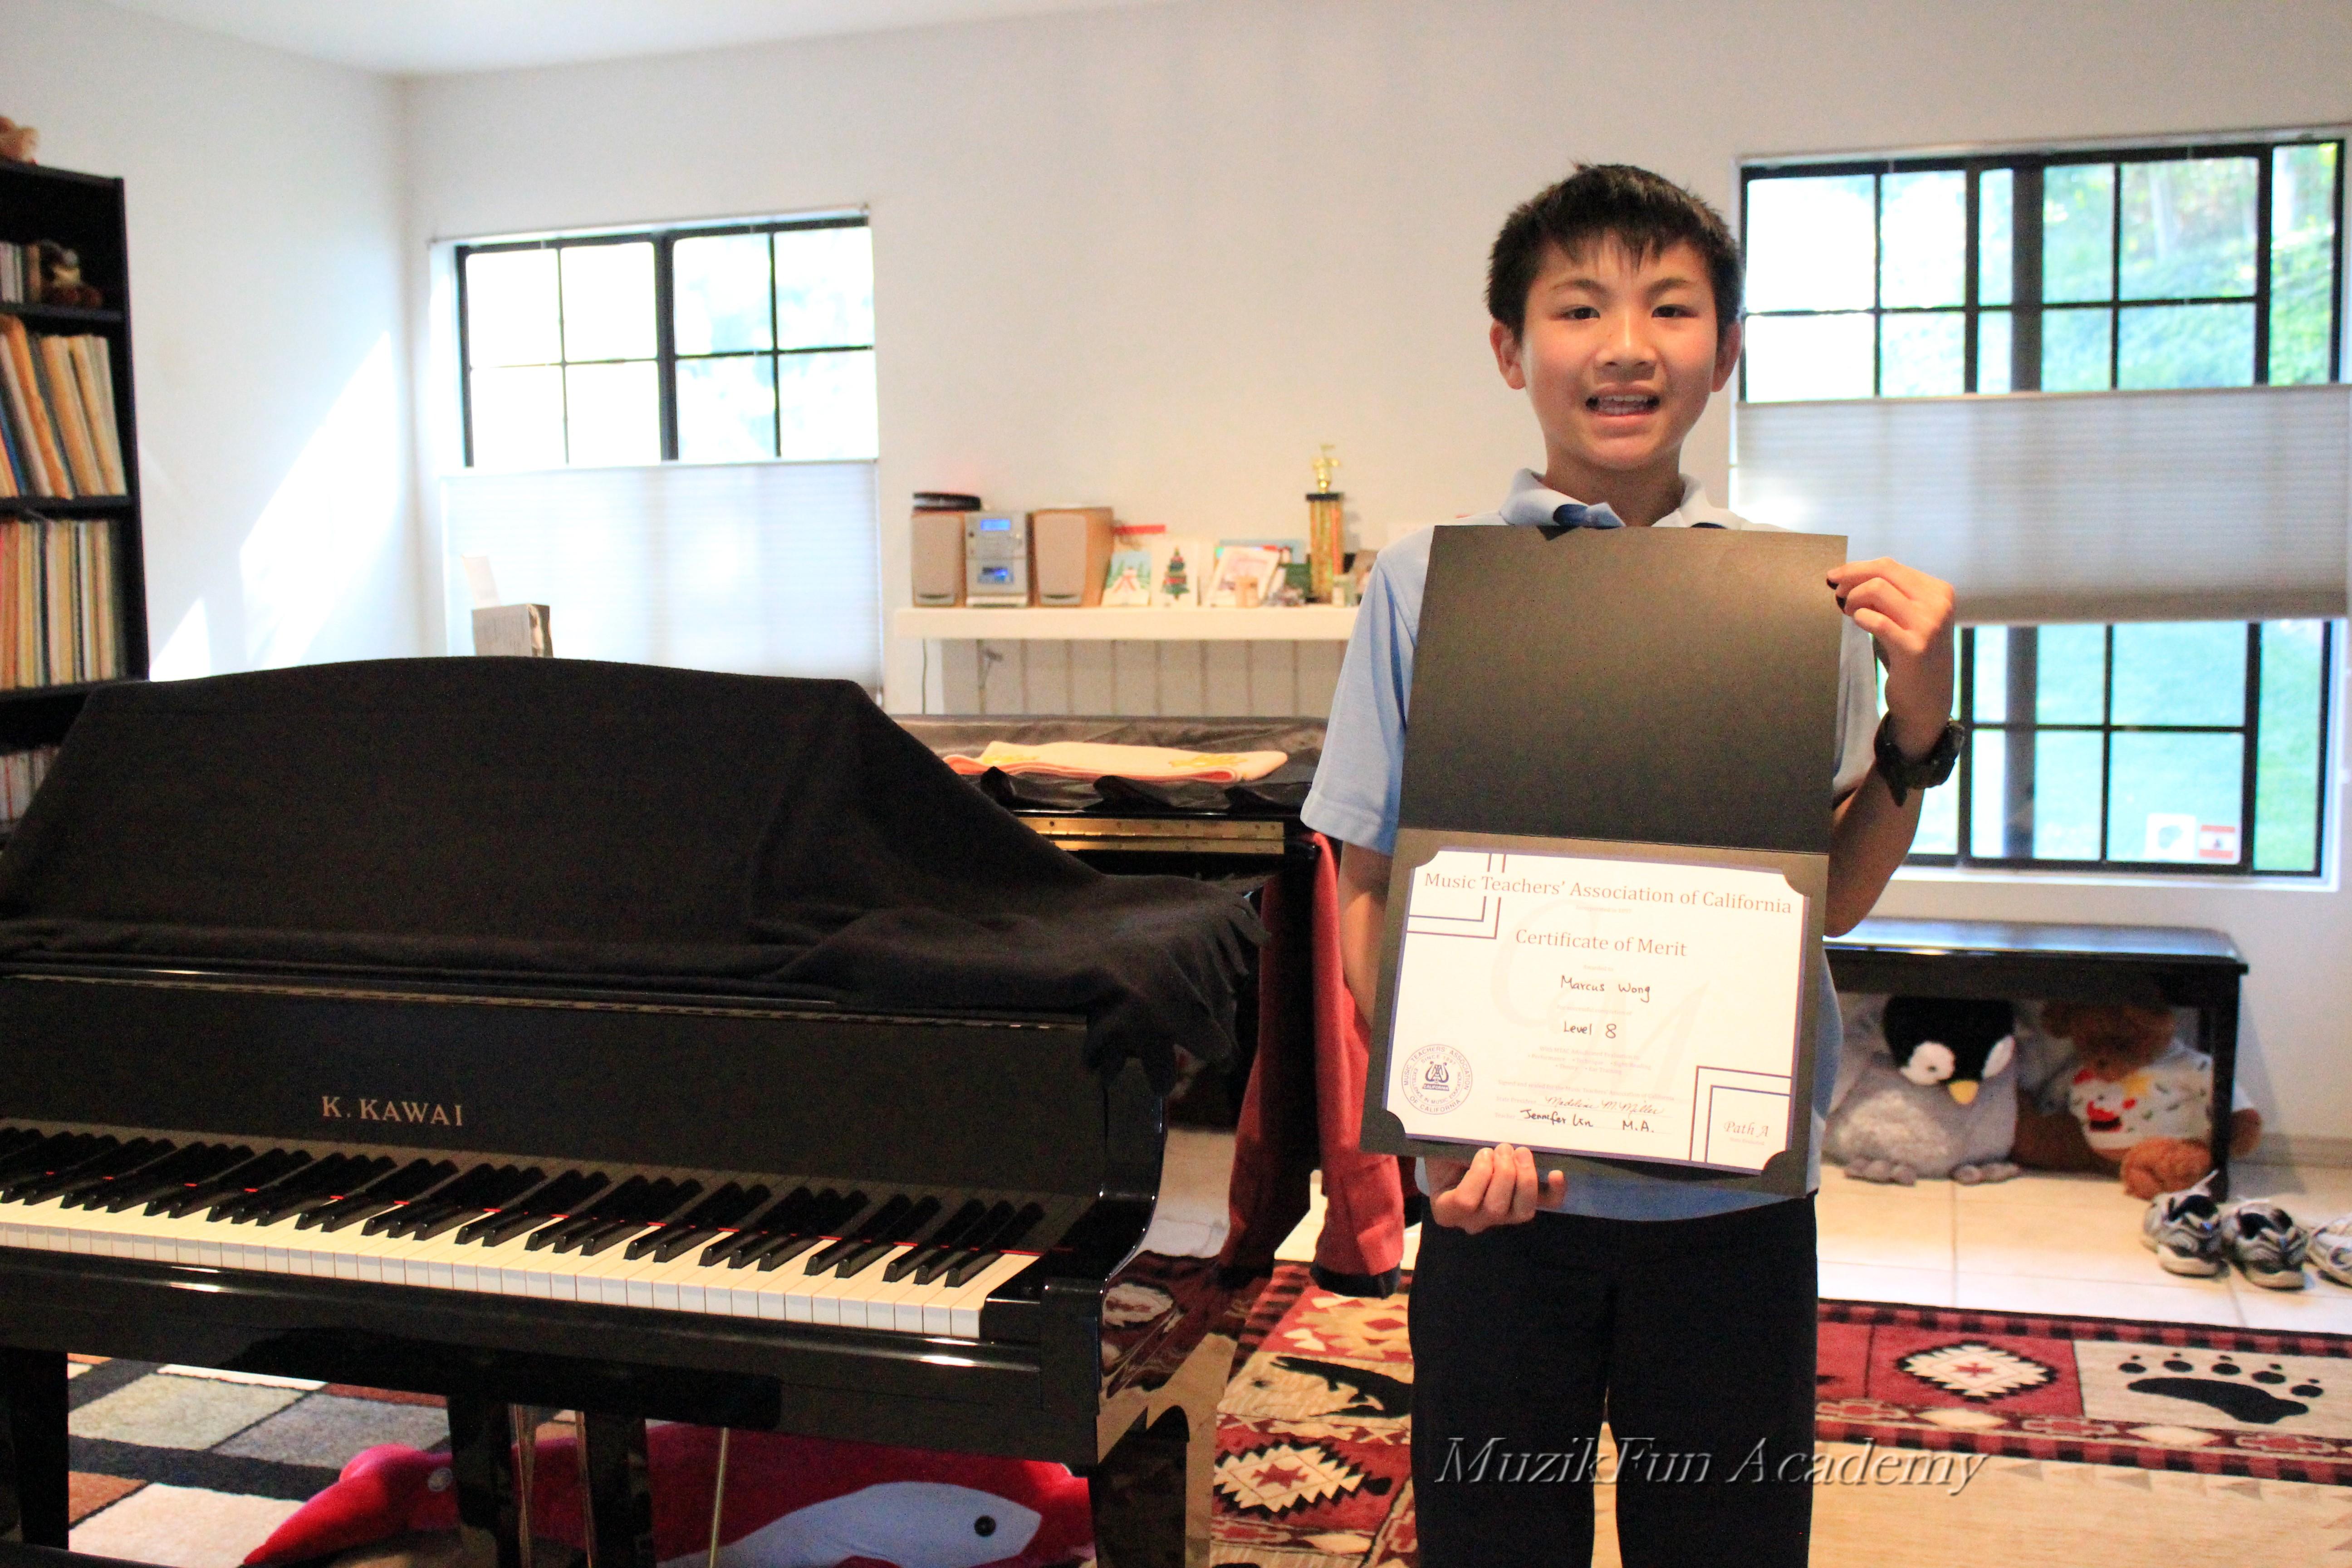 Certificate of merit cm muzikfun education marcus wong 7th grade cm level 8 xflitez Images